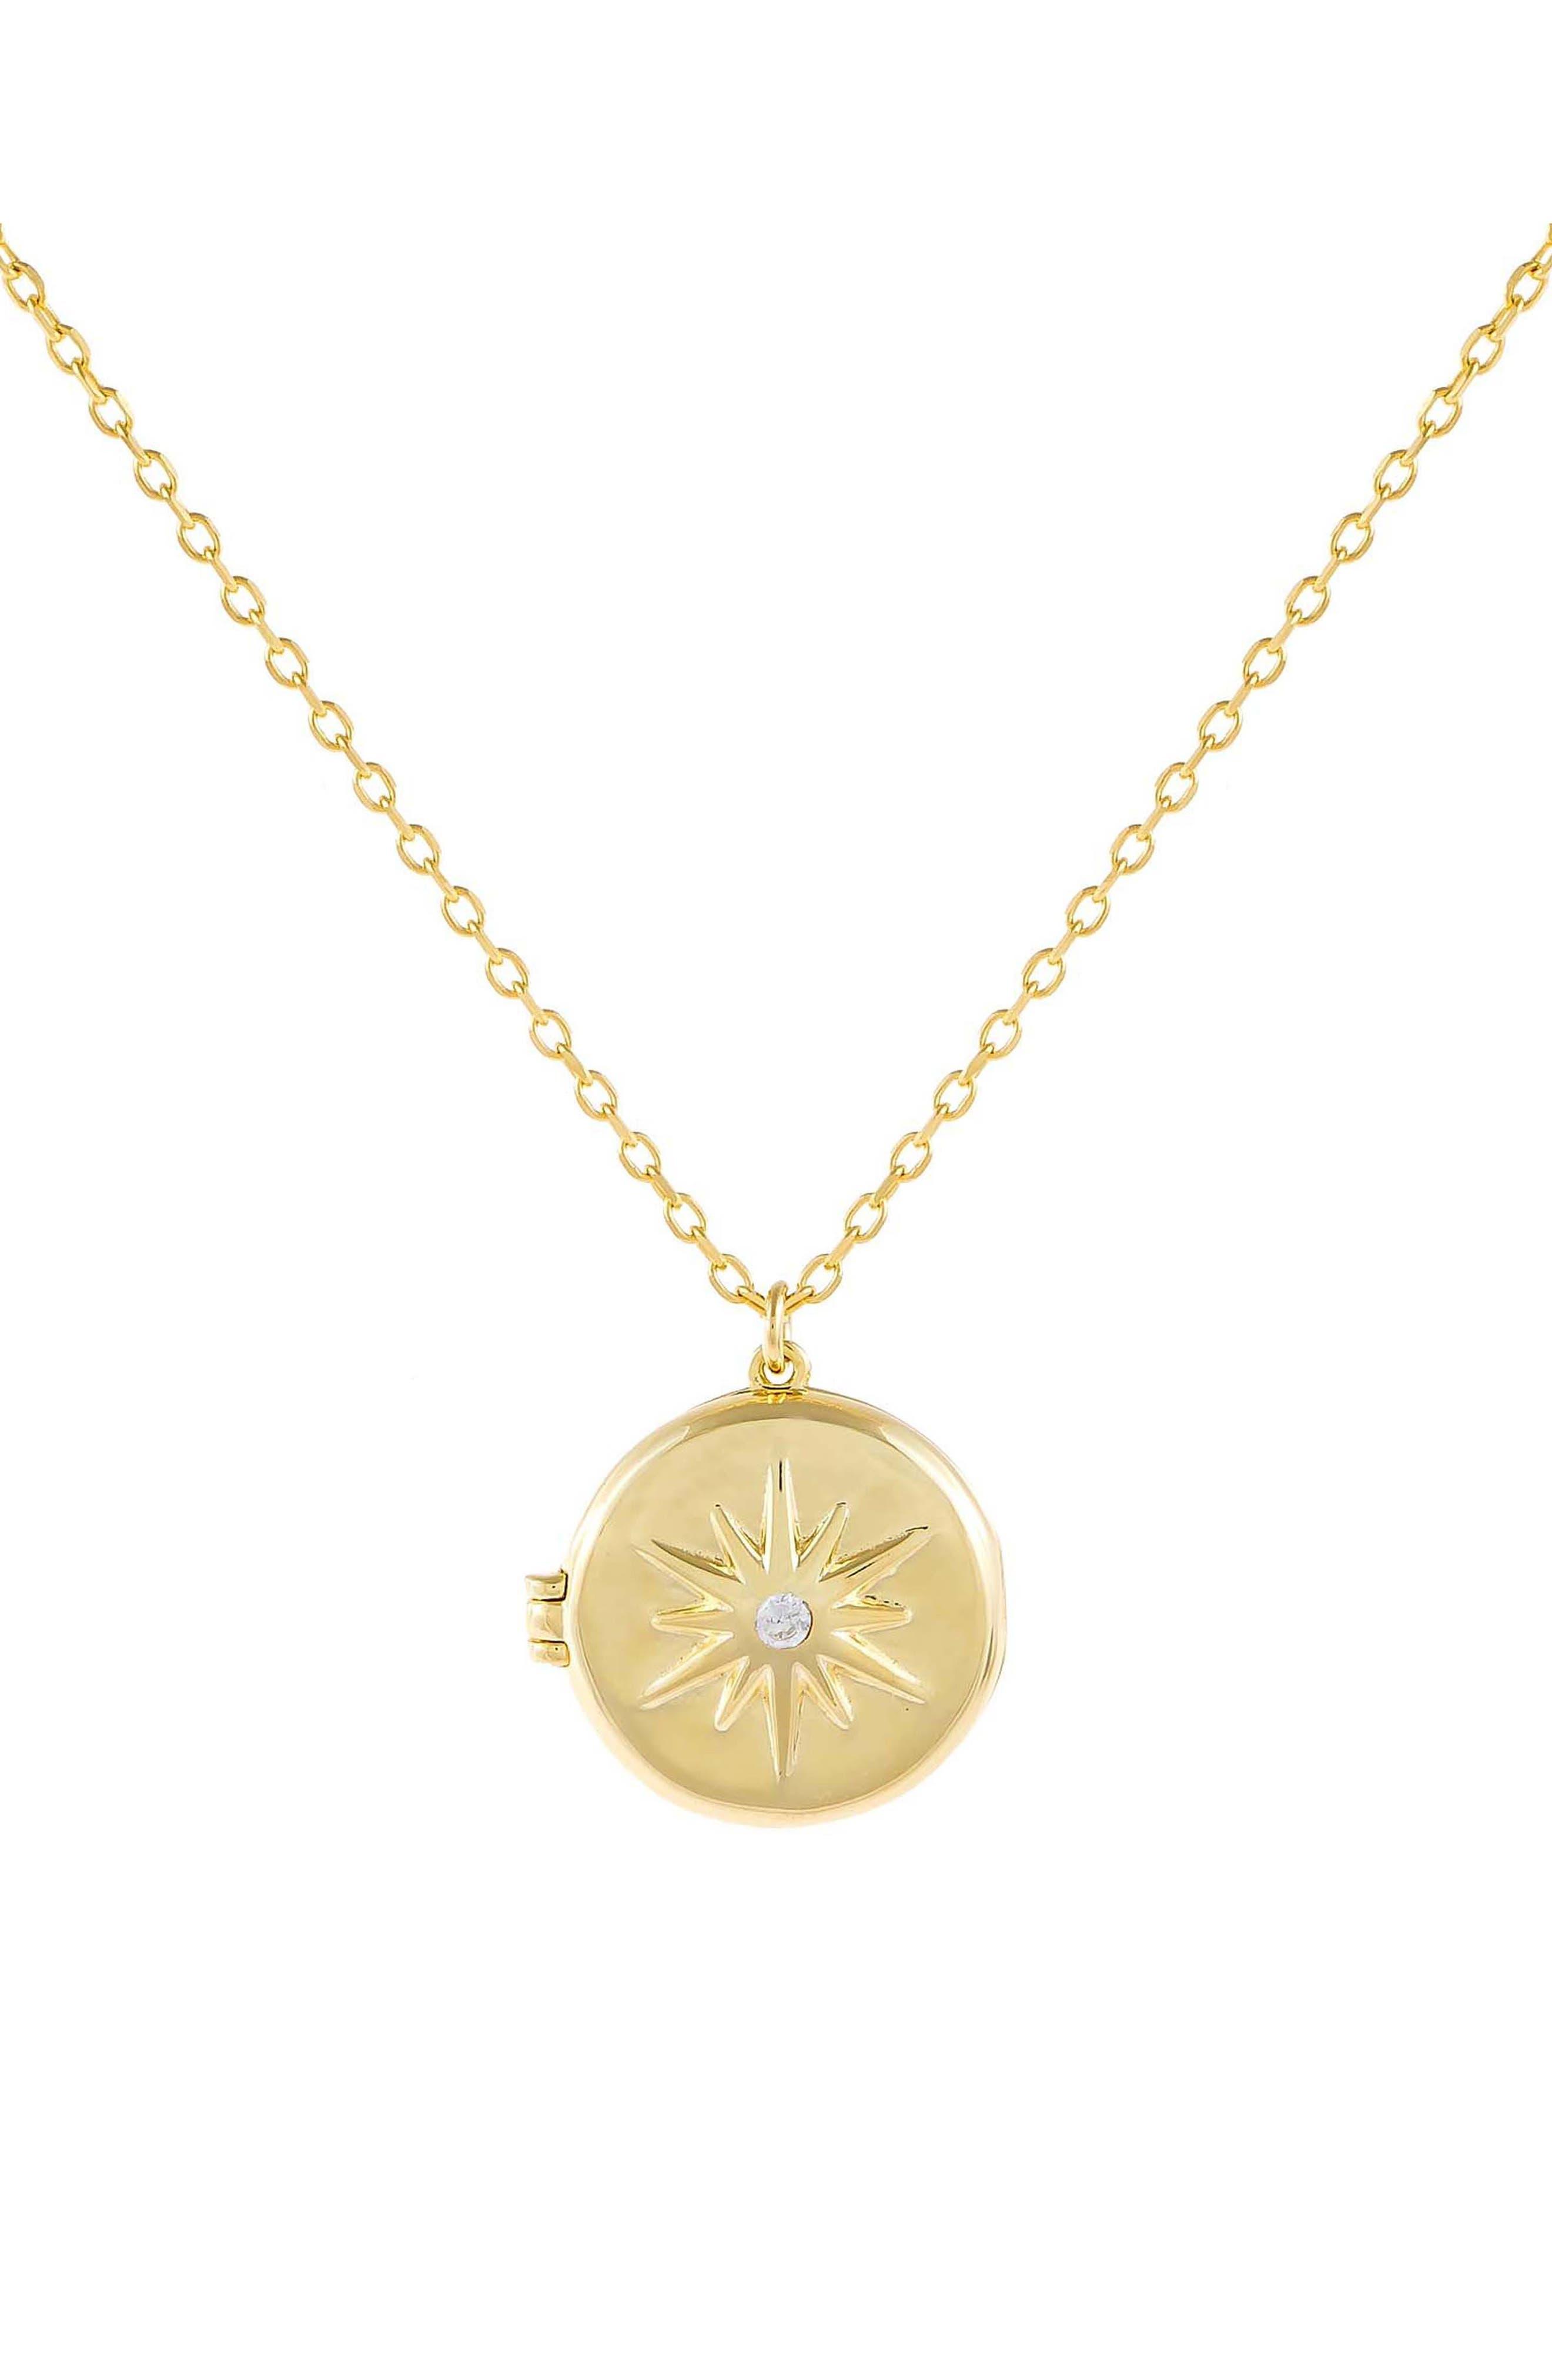 Women's Adina's Jewels Starburst Locket Necklace